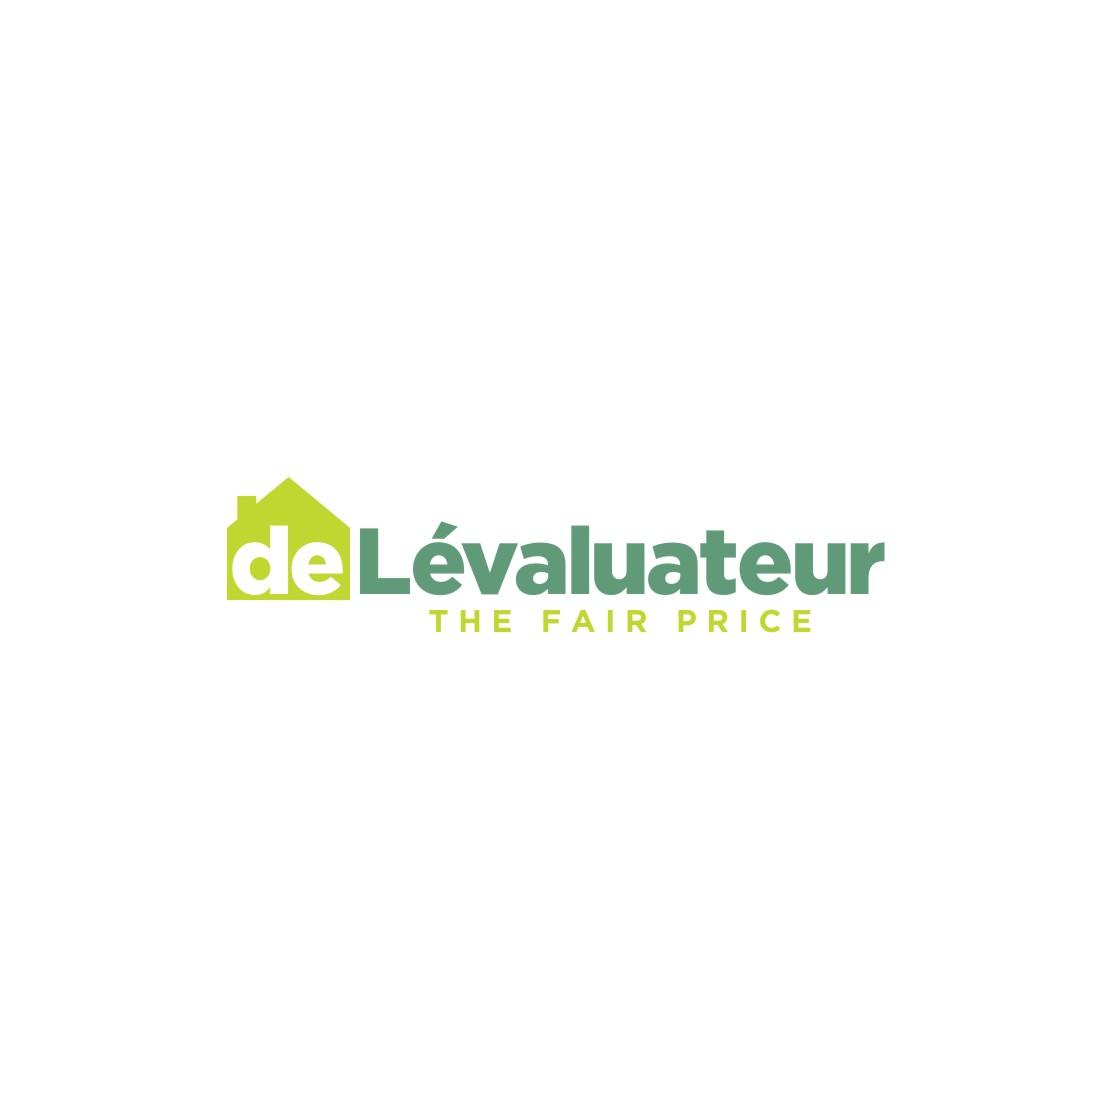 Logo Design by untung - Entry No. 59 in the Logo Design Contest Brand Logo Design et Icon design for brand logo de Lévaluateur.